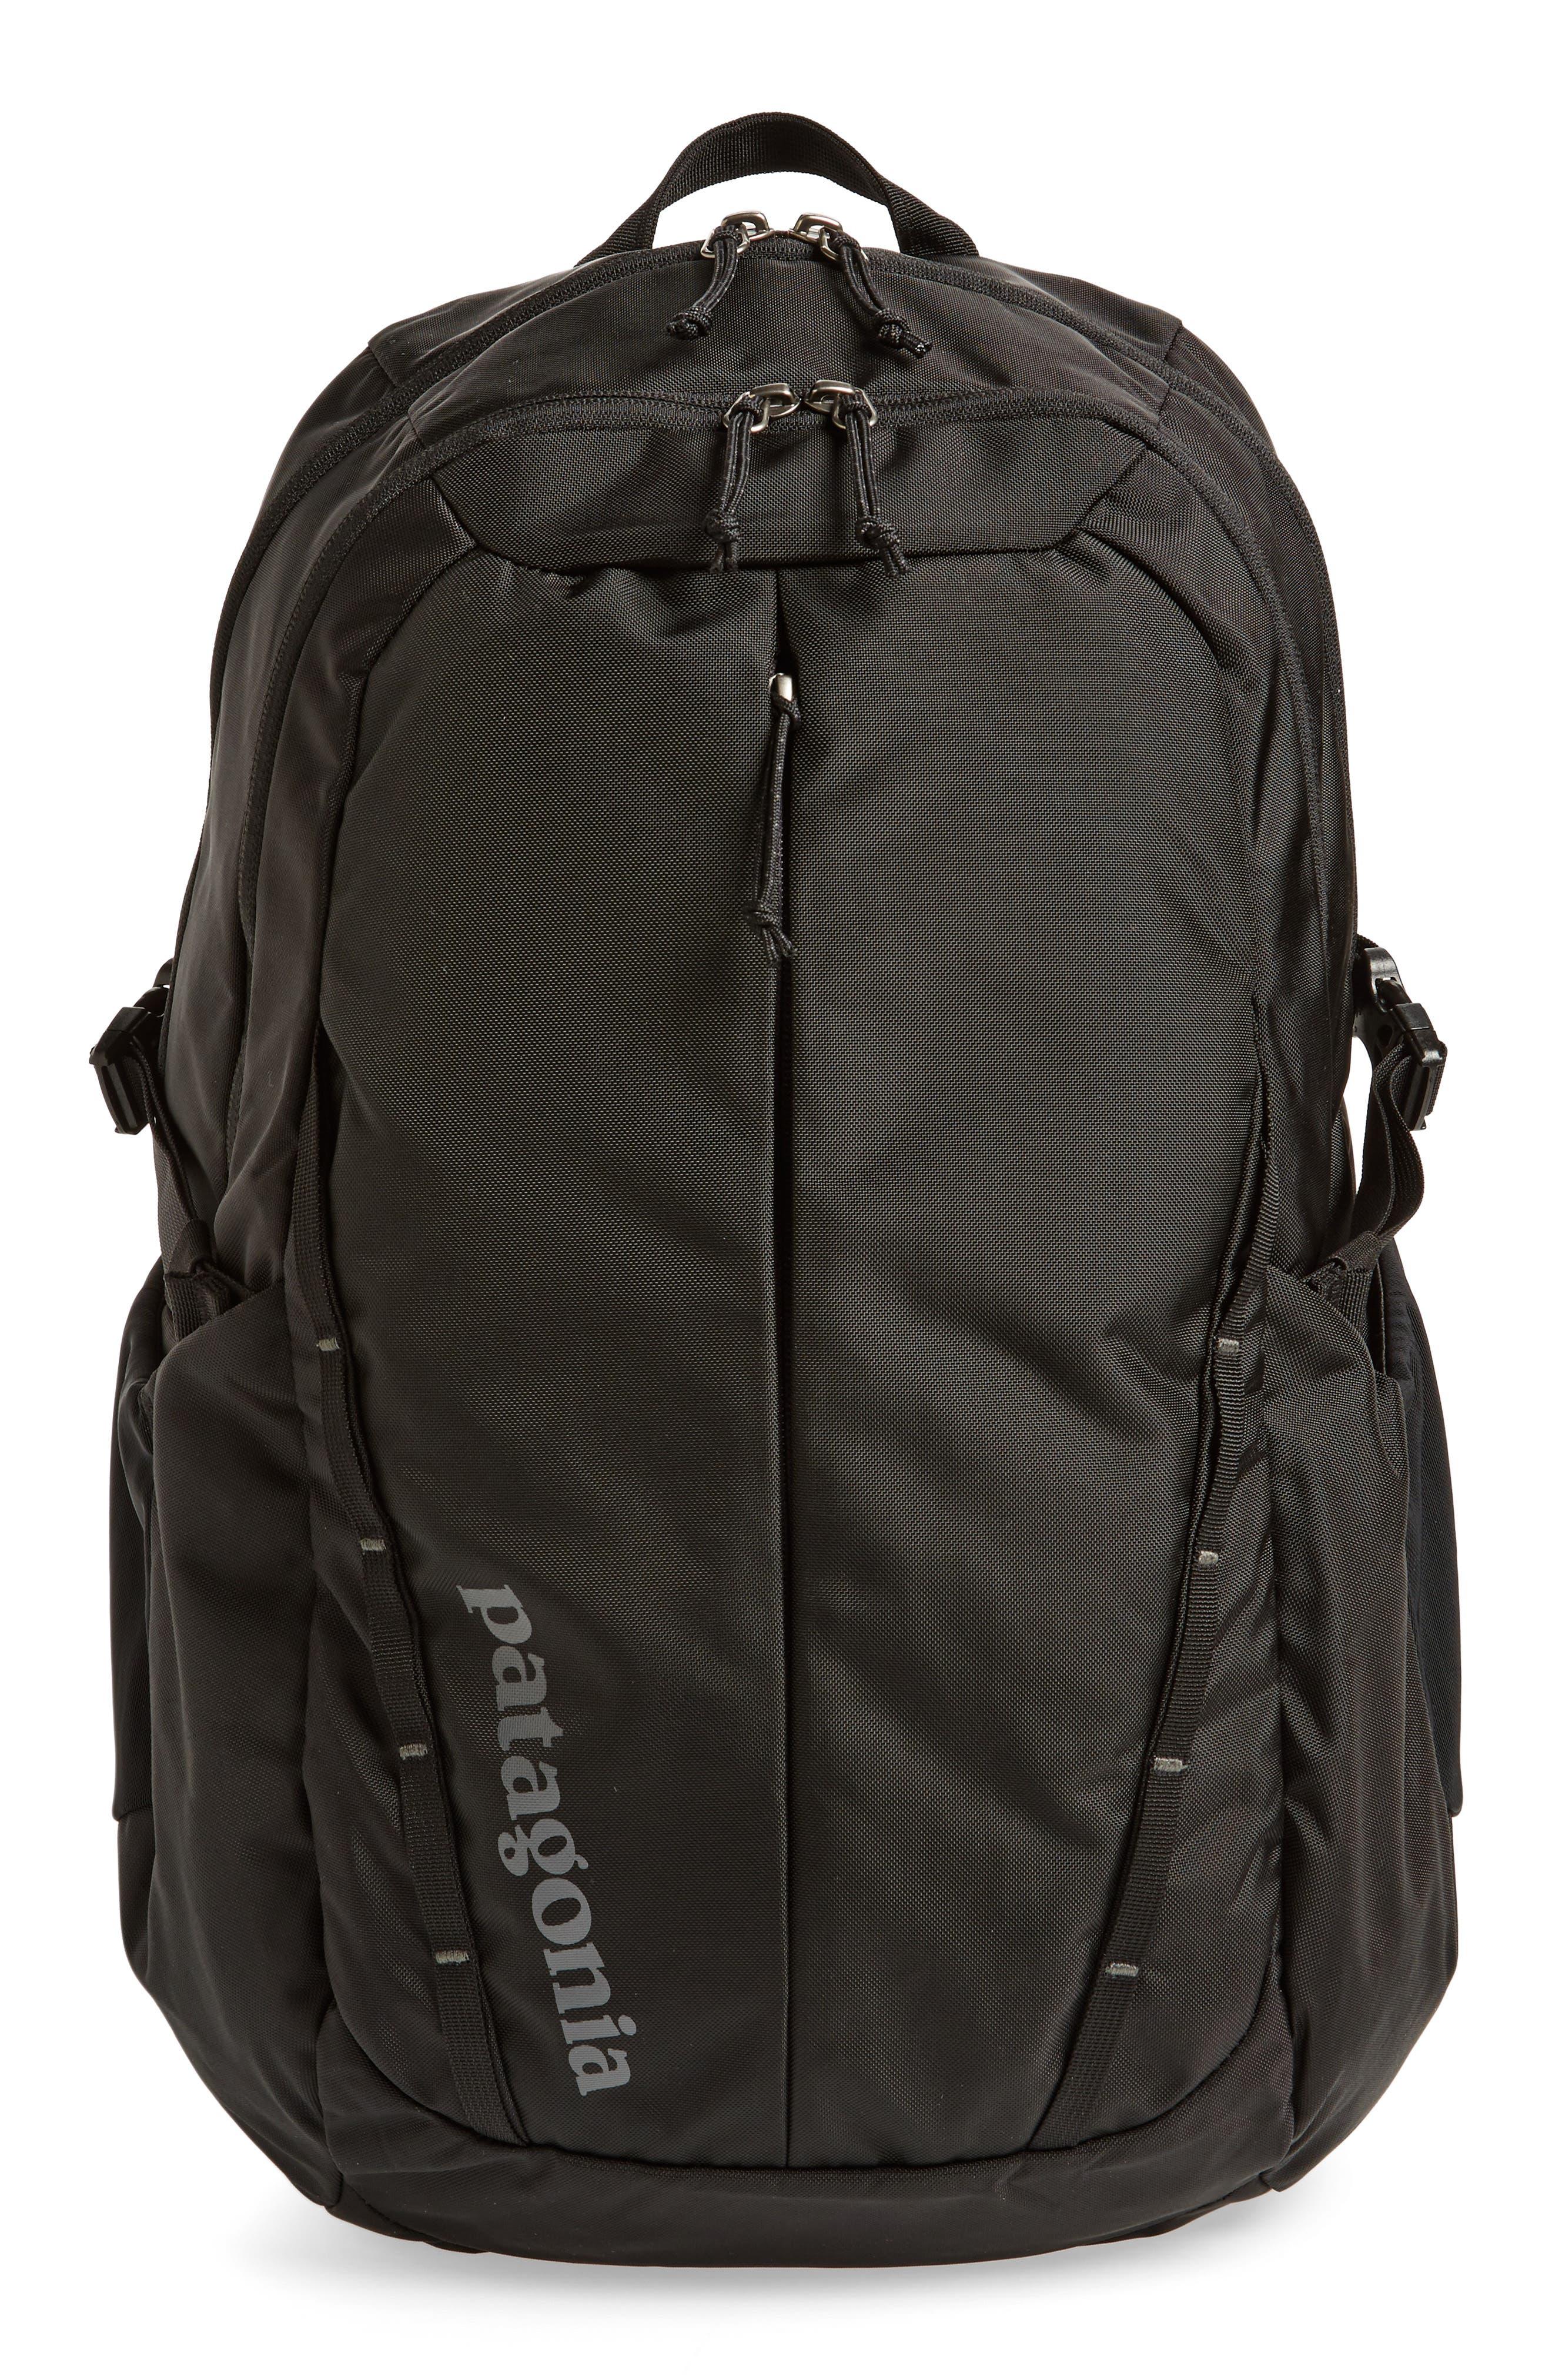 28L Refugio Backpack,                             Main thumbnail 1, color,                             Black